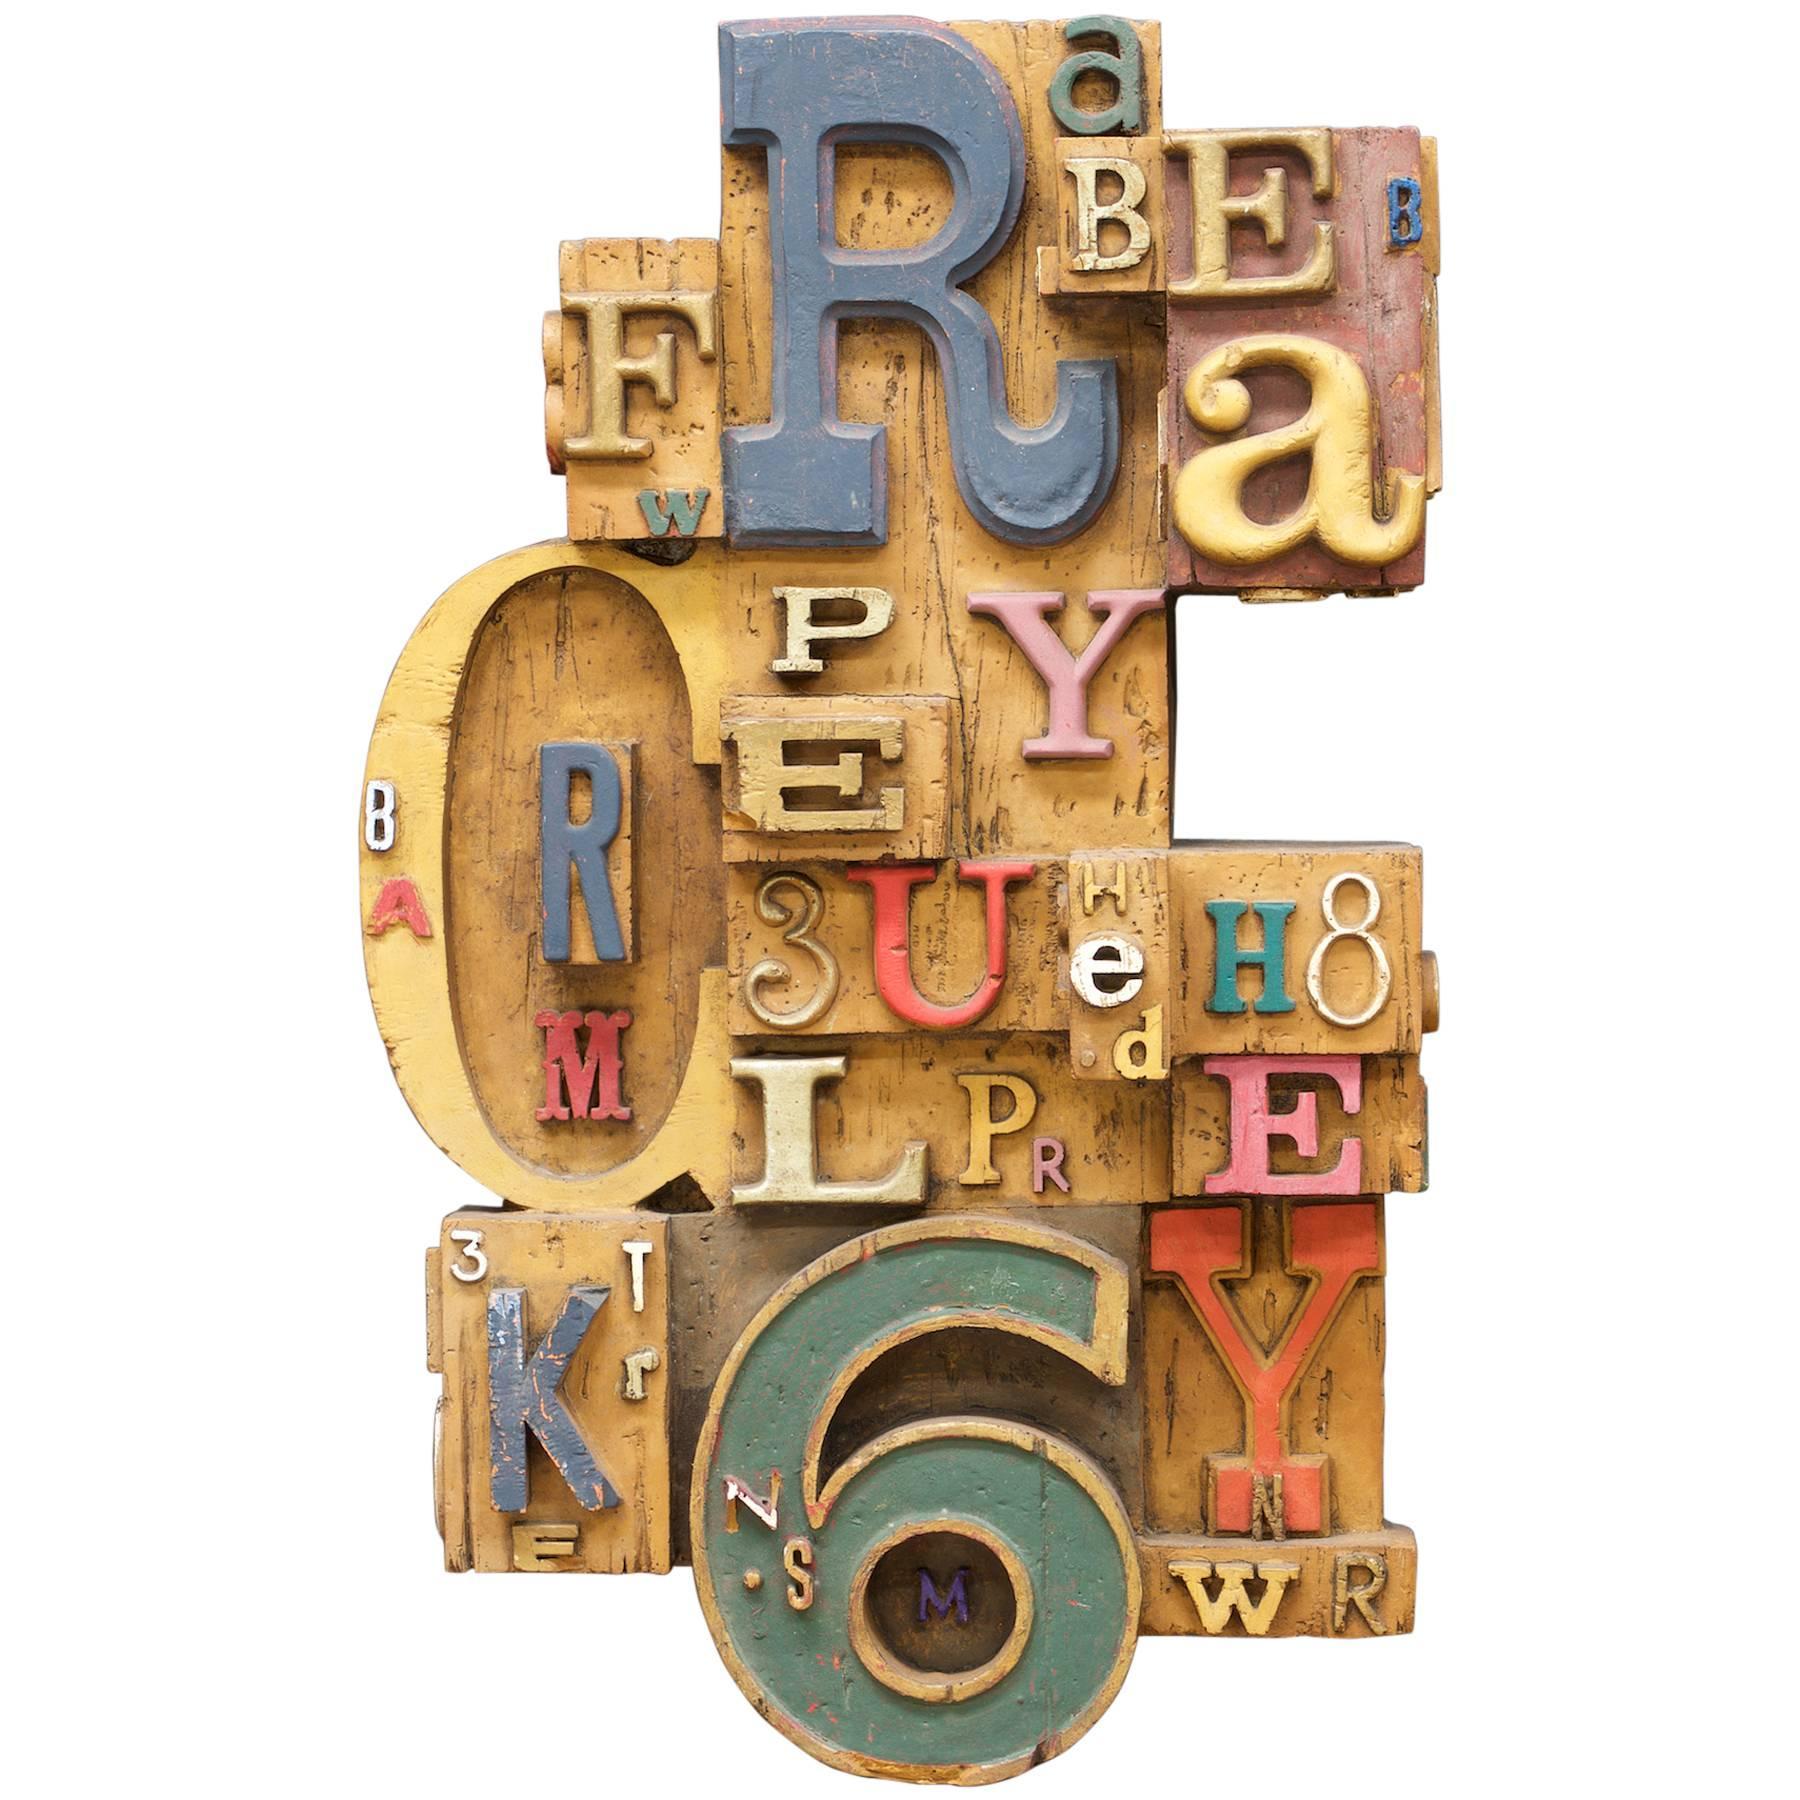 1960s Vintage Brutalist Typeface Typesetter 3D Painted Wall Art Sculpture